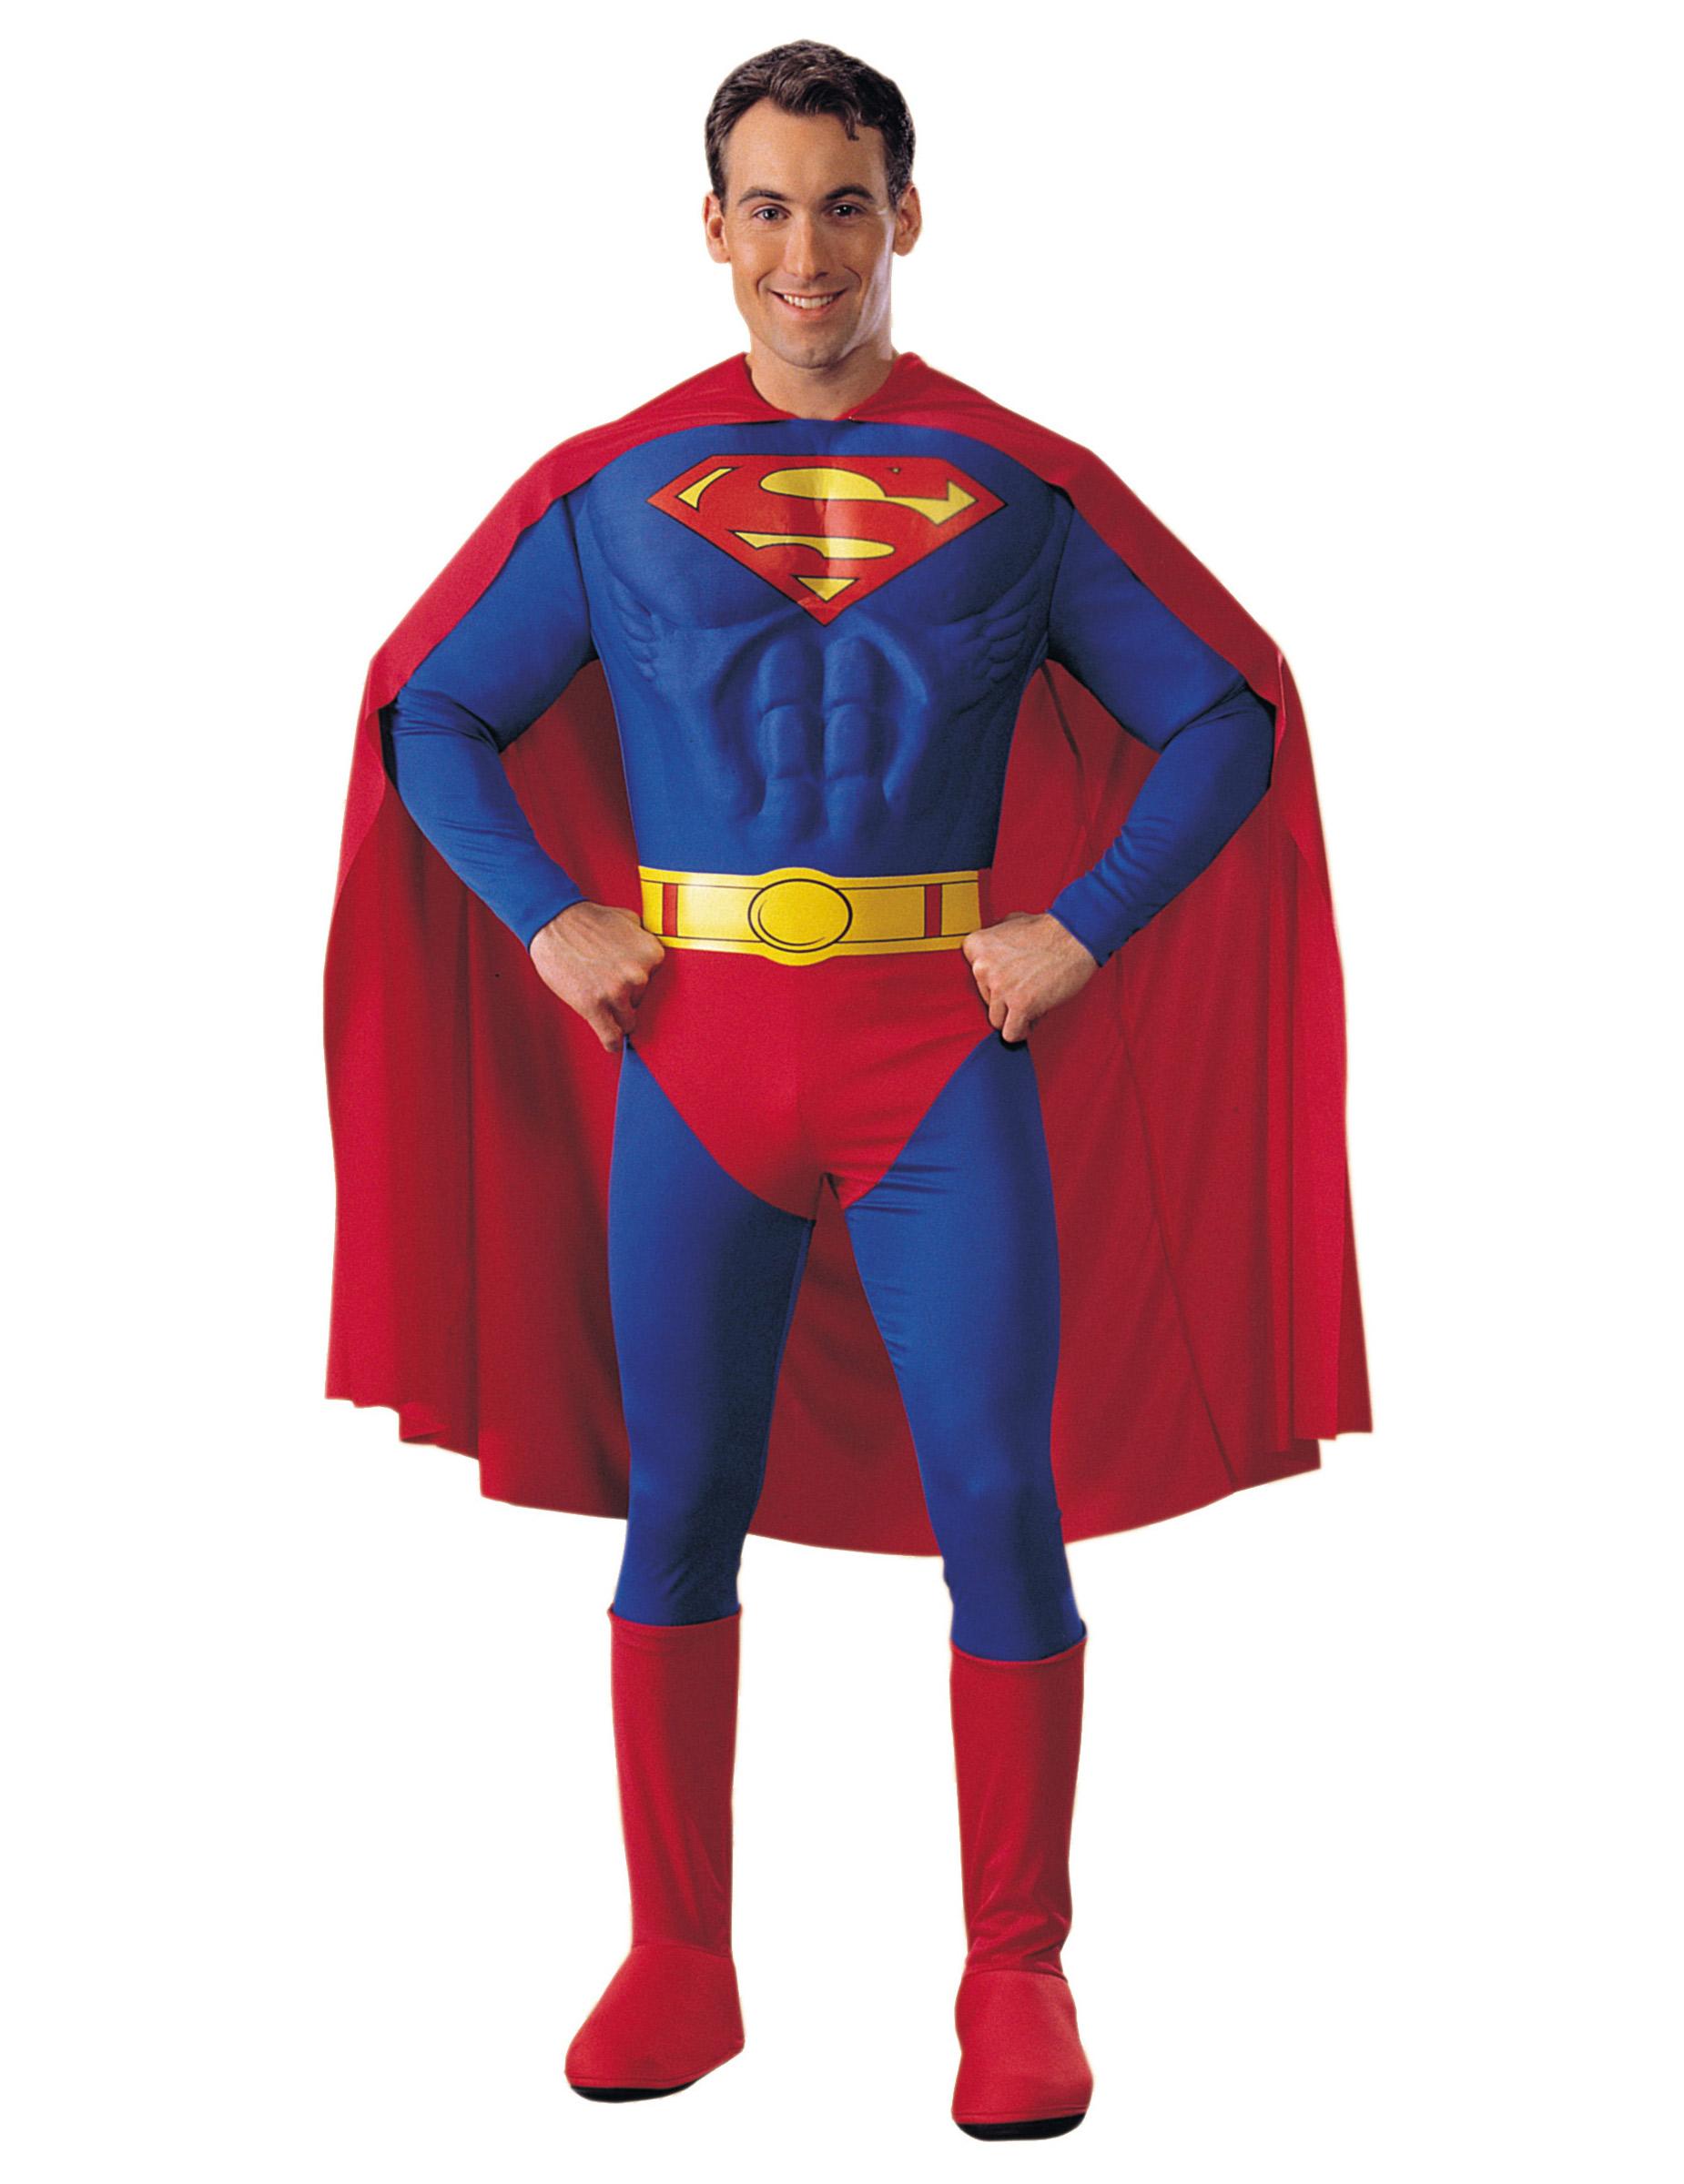 superman kost m f r erwachsene kost me f r erwachsene und g nstige faschingskost me vegaoo. Black Bedroom Furniture Sets. Home Design Ideas